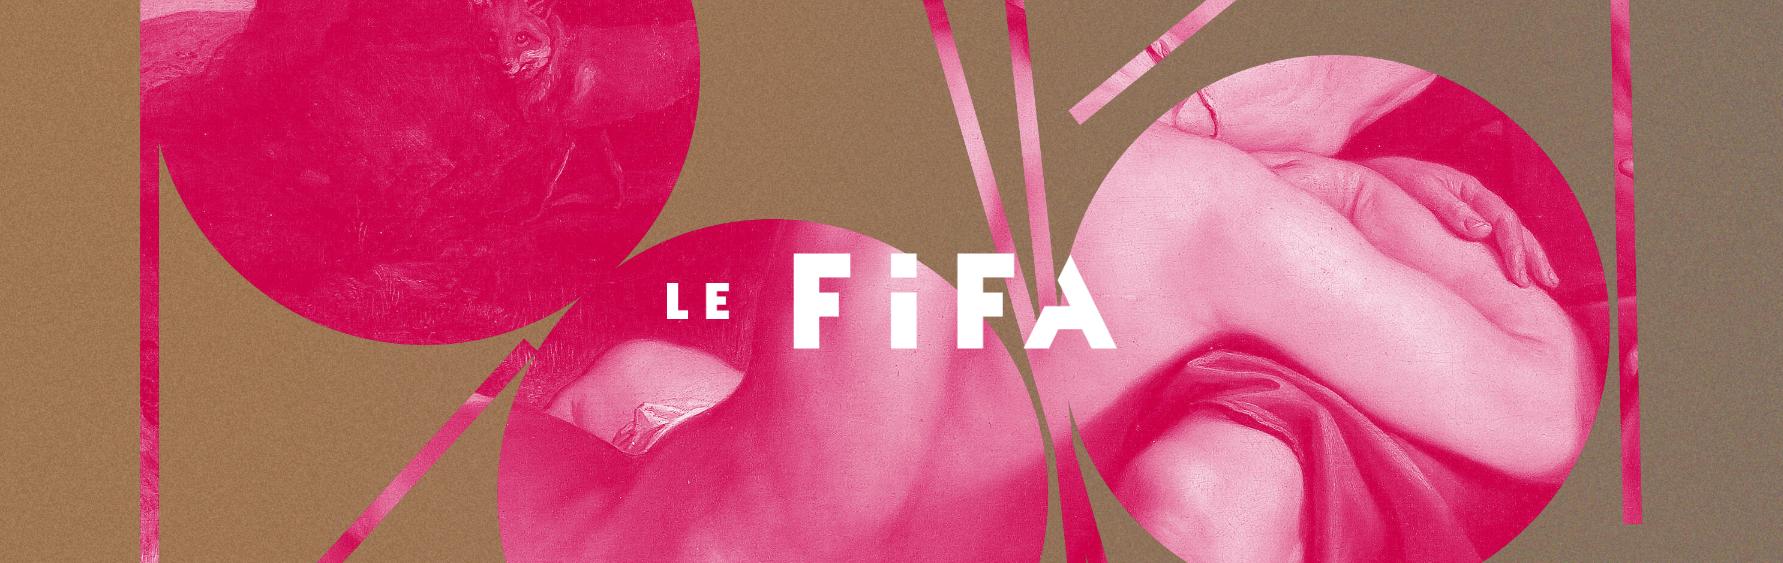 FIFA – Soirée FIFA x Kollectif | Architecture et Design